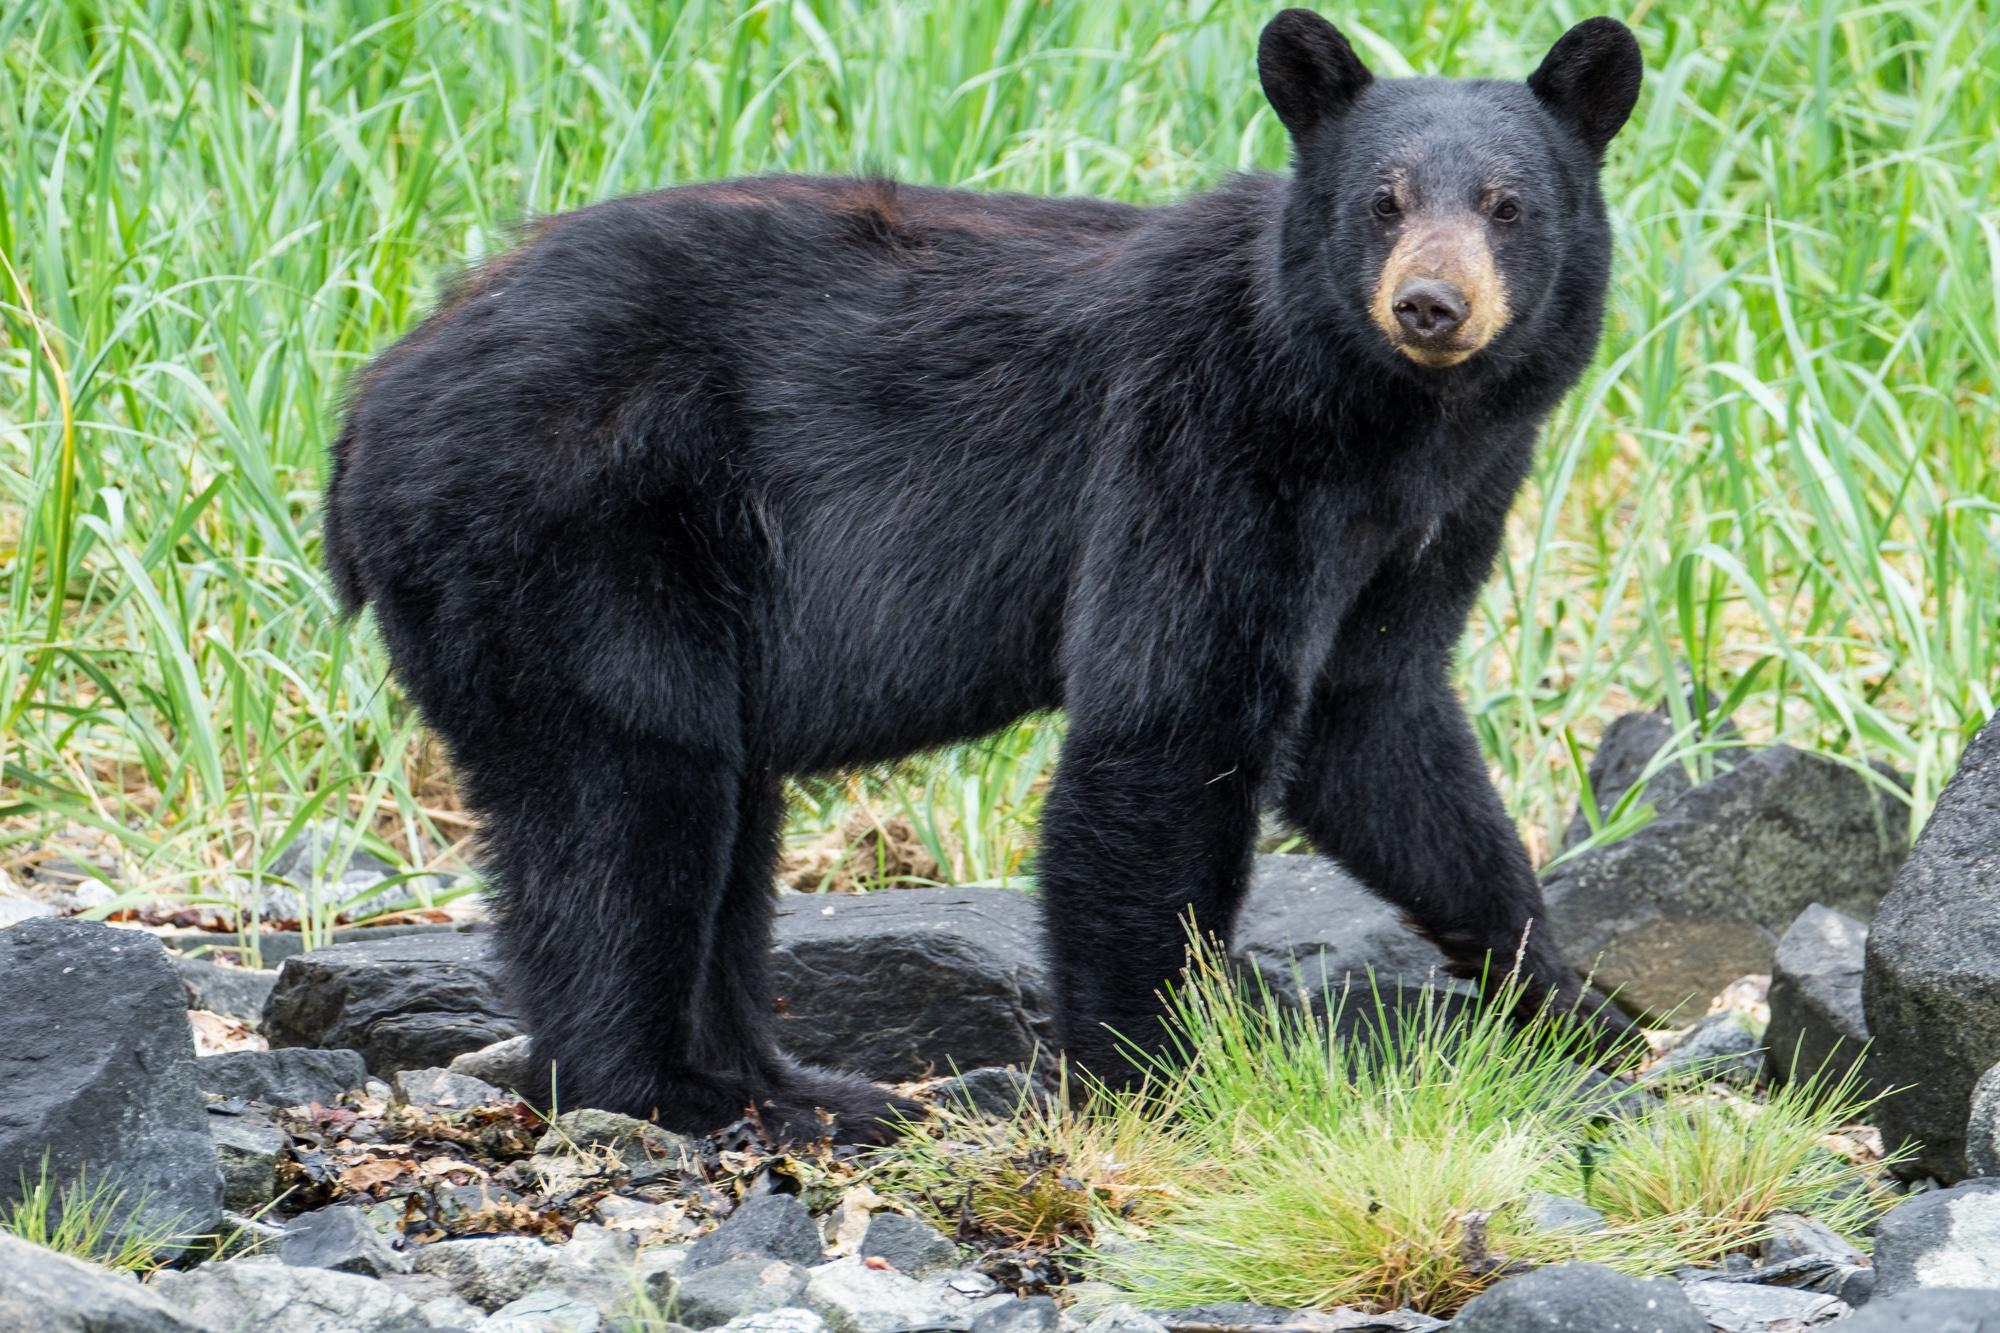 We saw this nice black bear on the shore while kayaking.